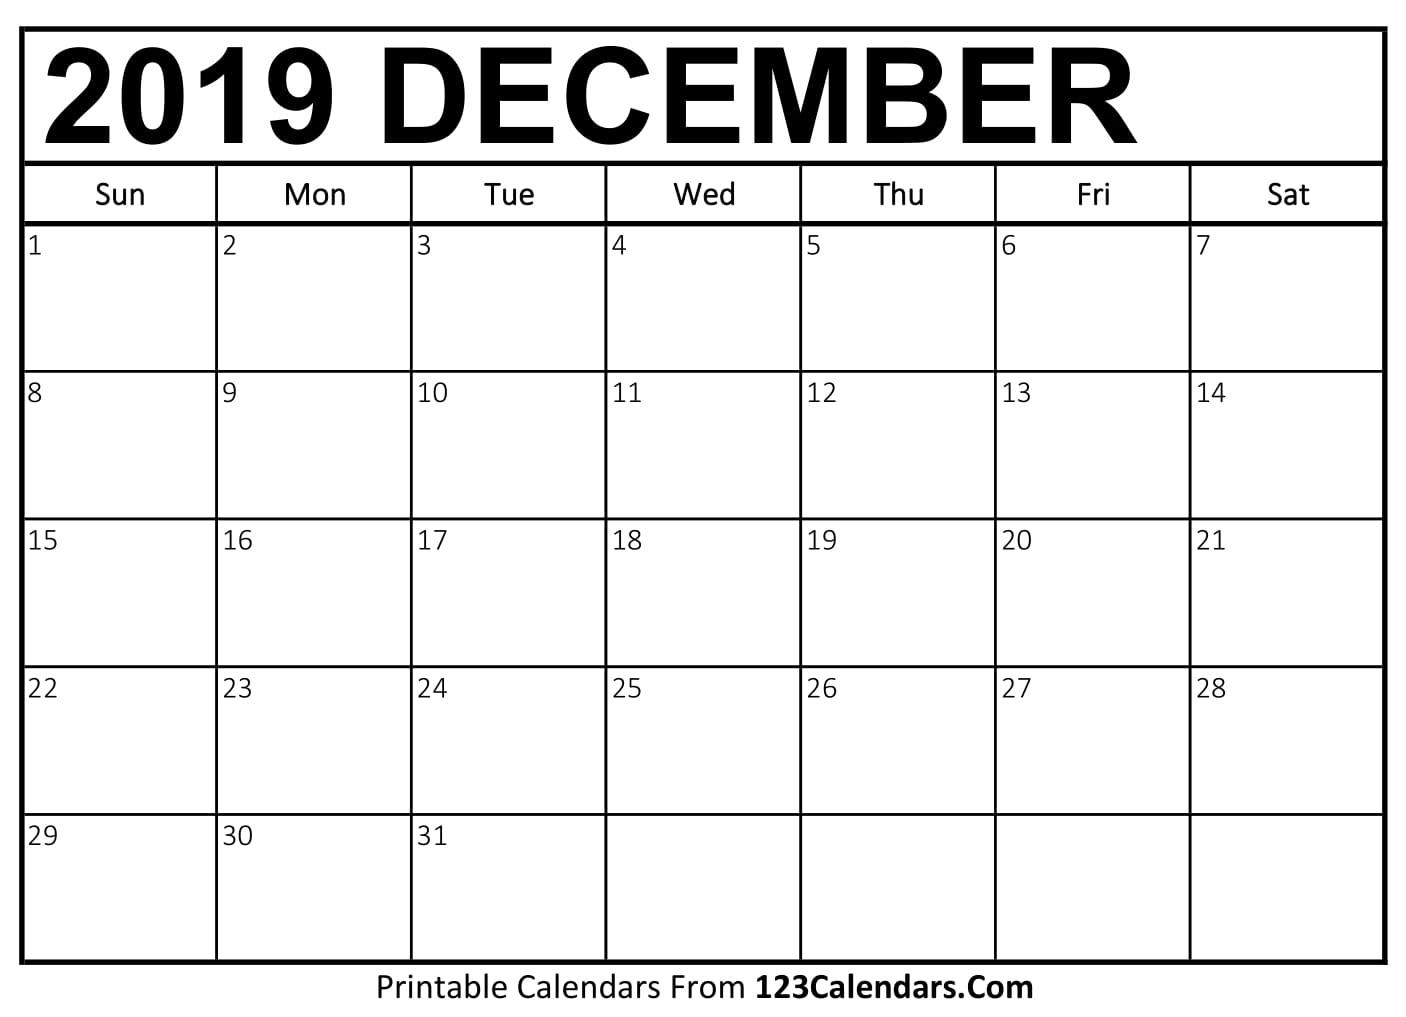 December 2019 Calendar Blank Easily Printable 123calendars